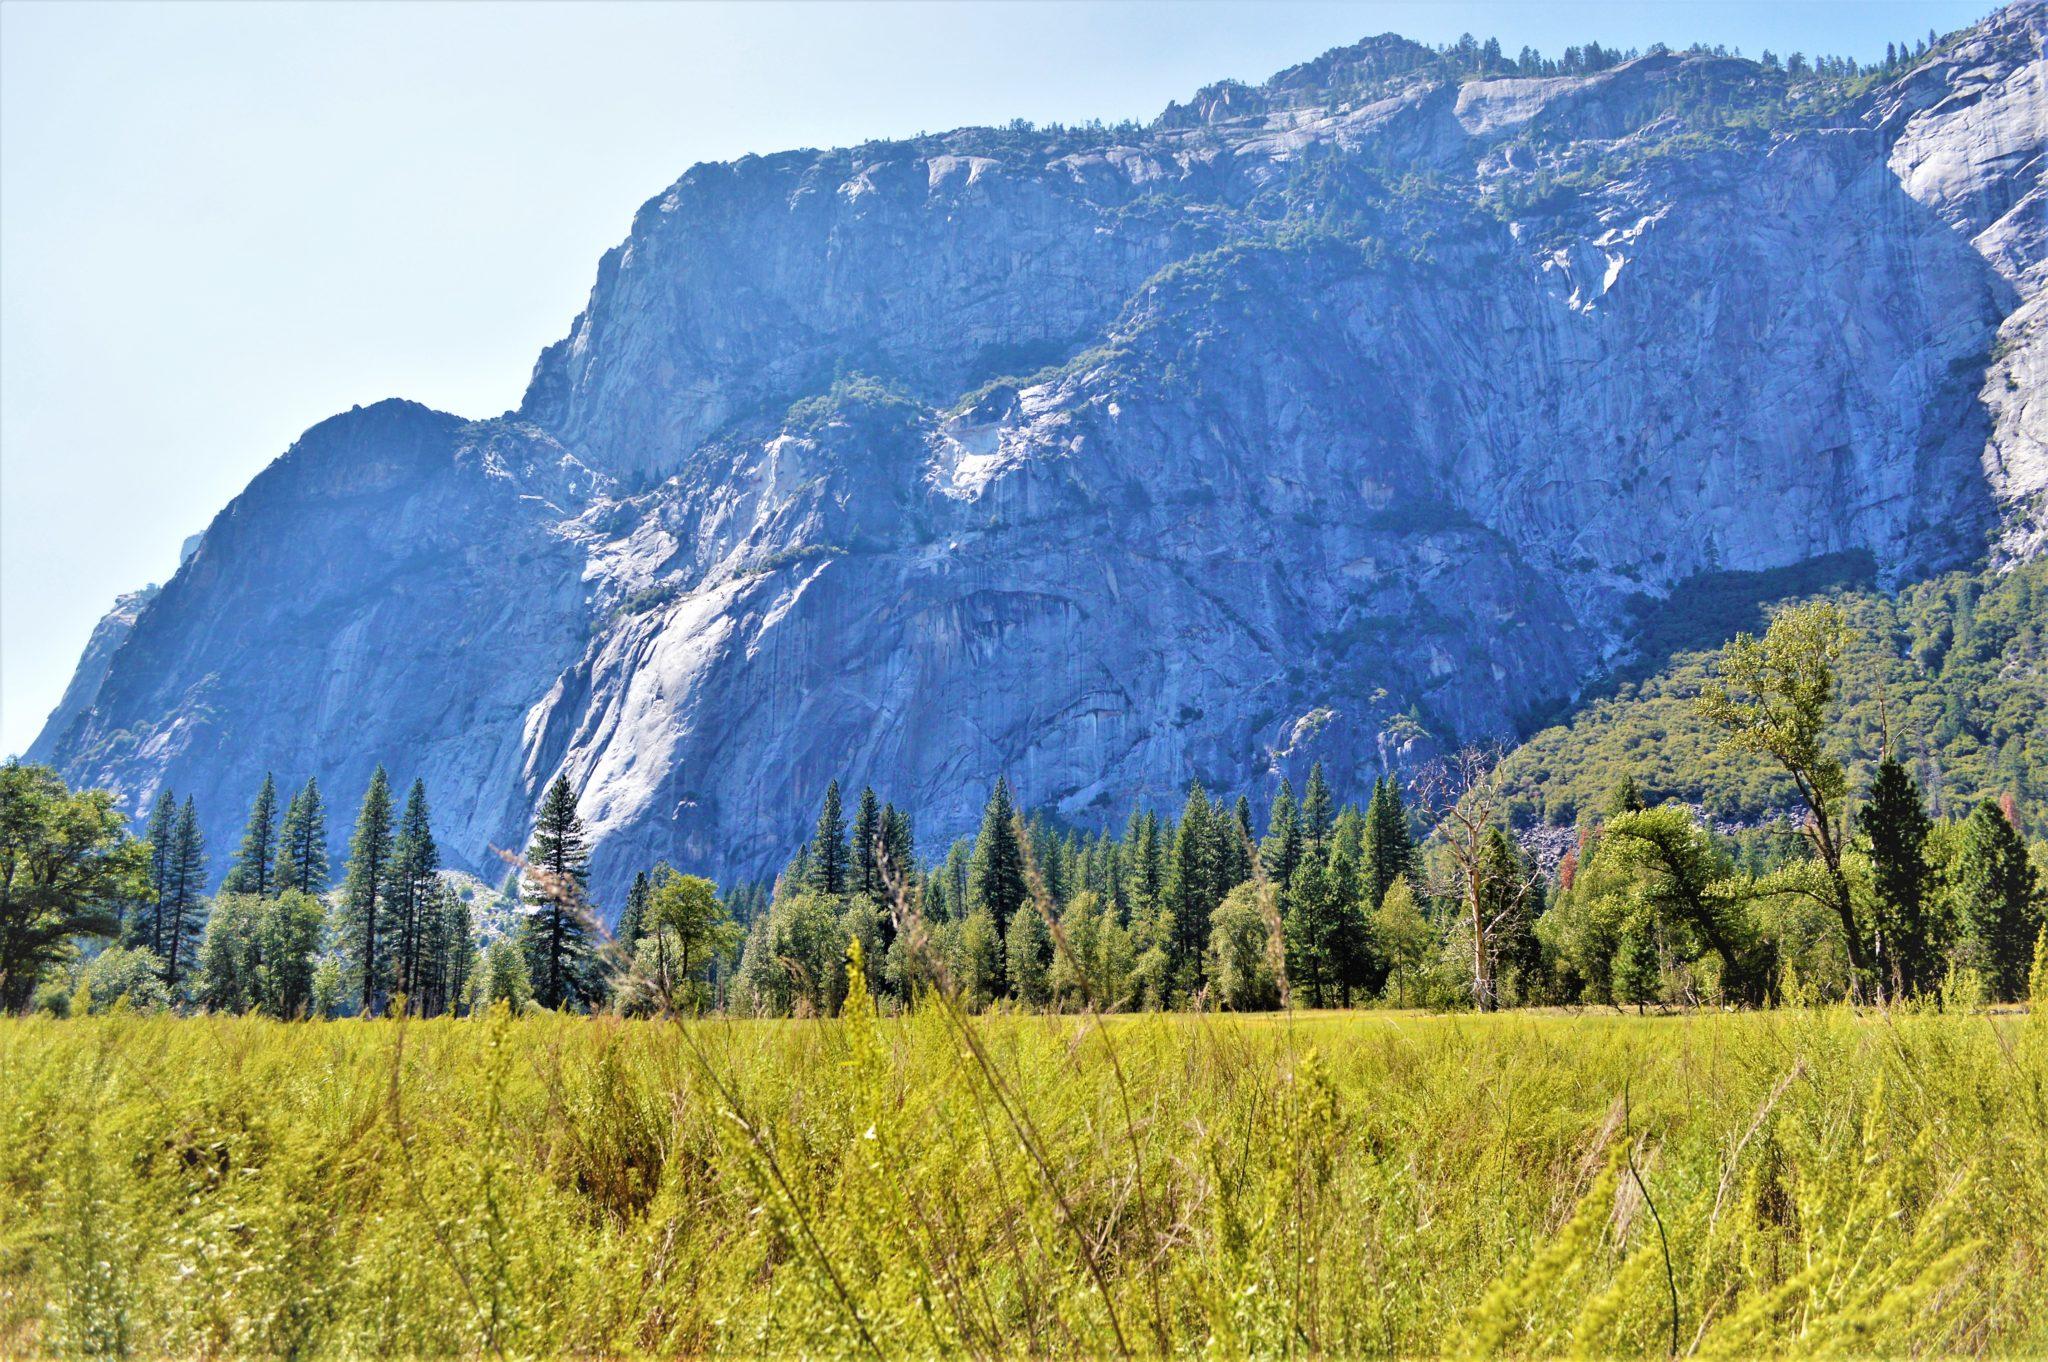 Mountains and meadows, Yosemite National Park, California